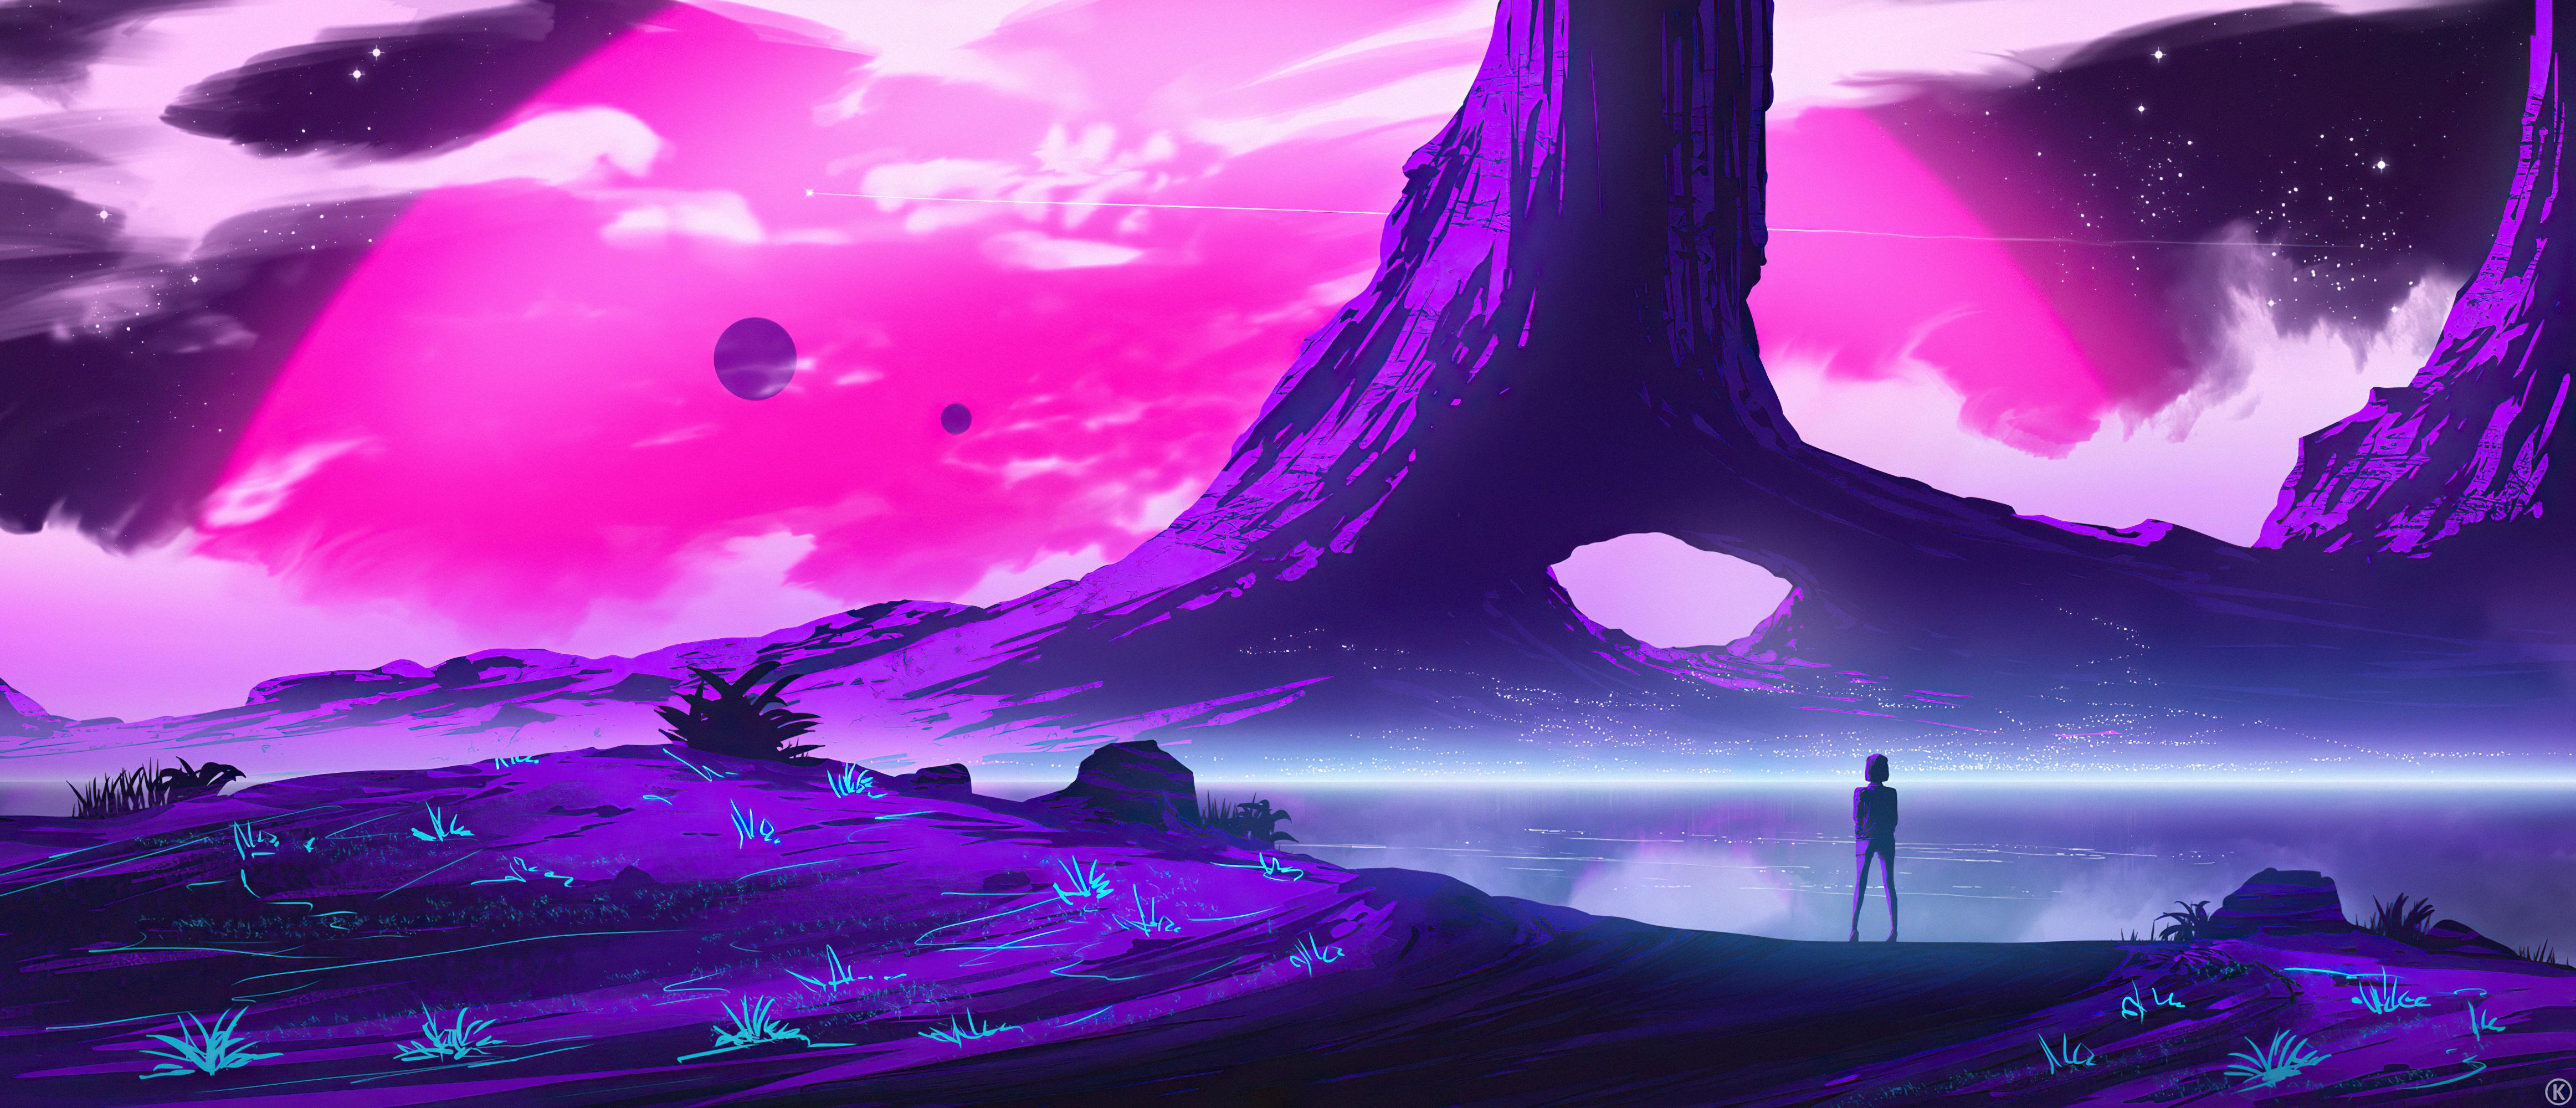 General 4650x2000 artwork ArtStation 4 k landscape purple background